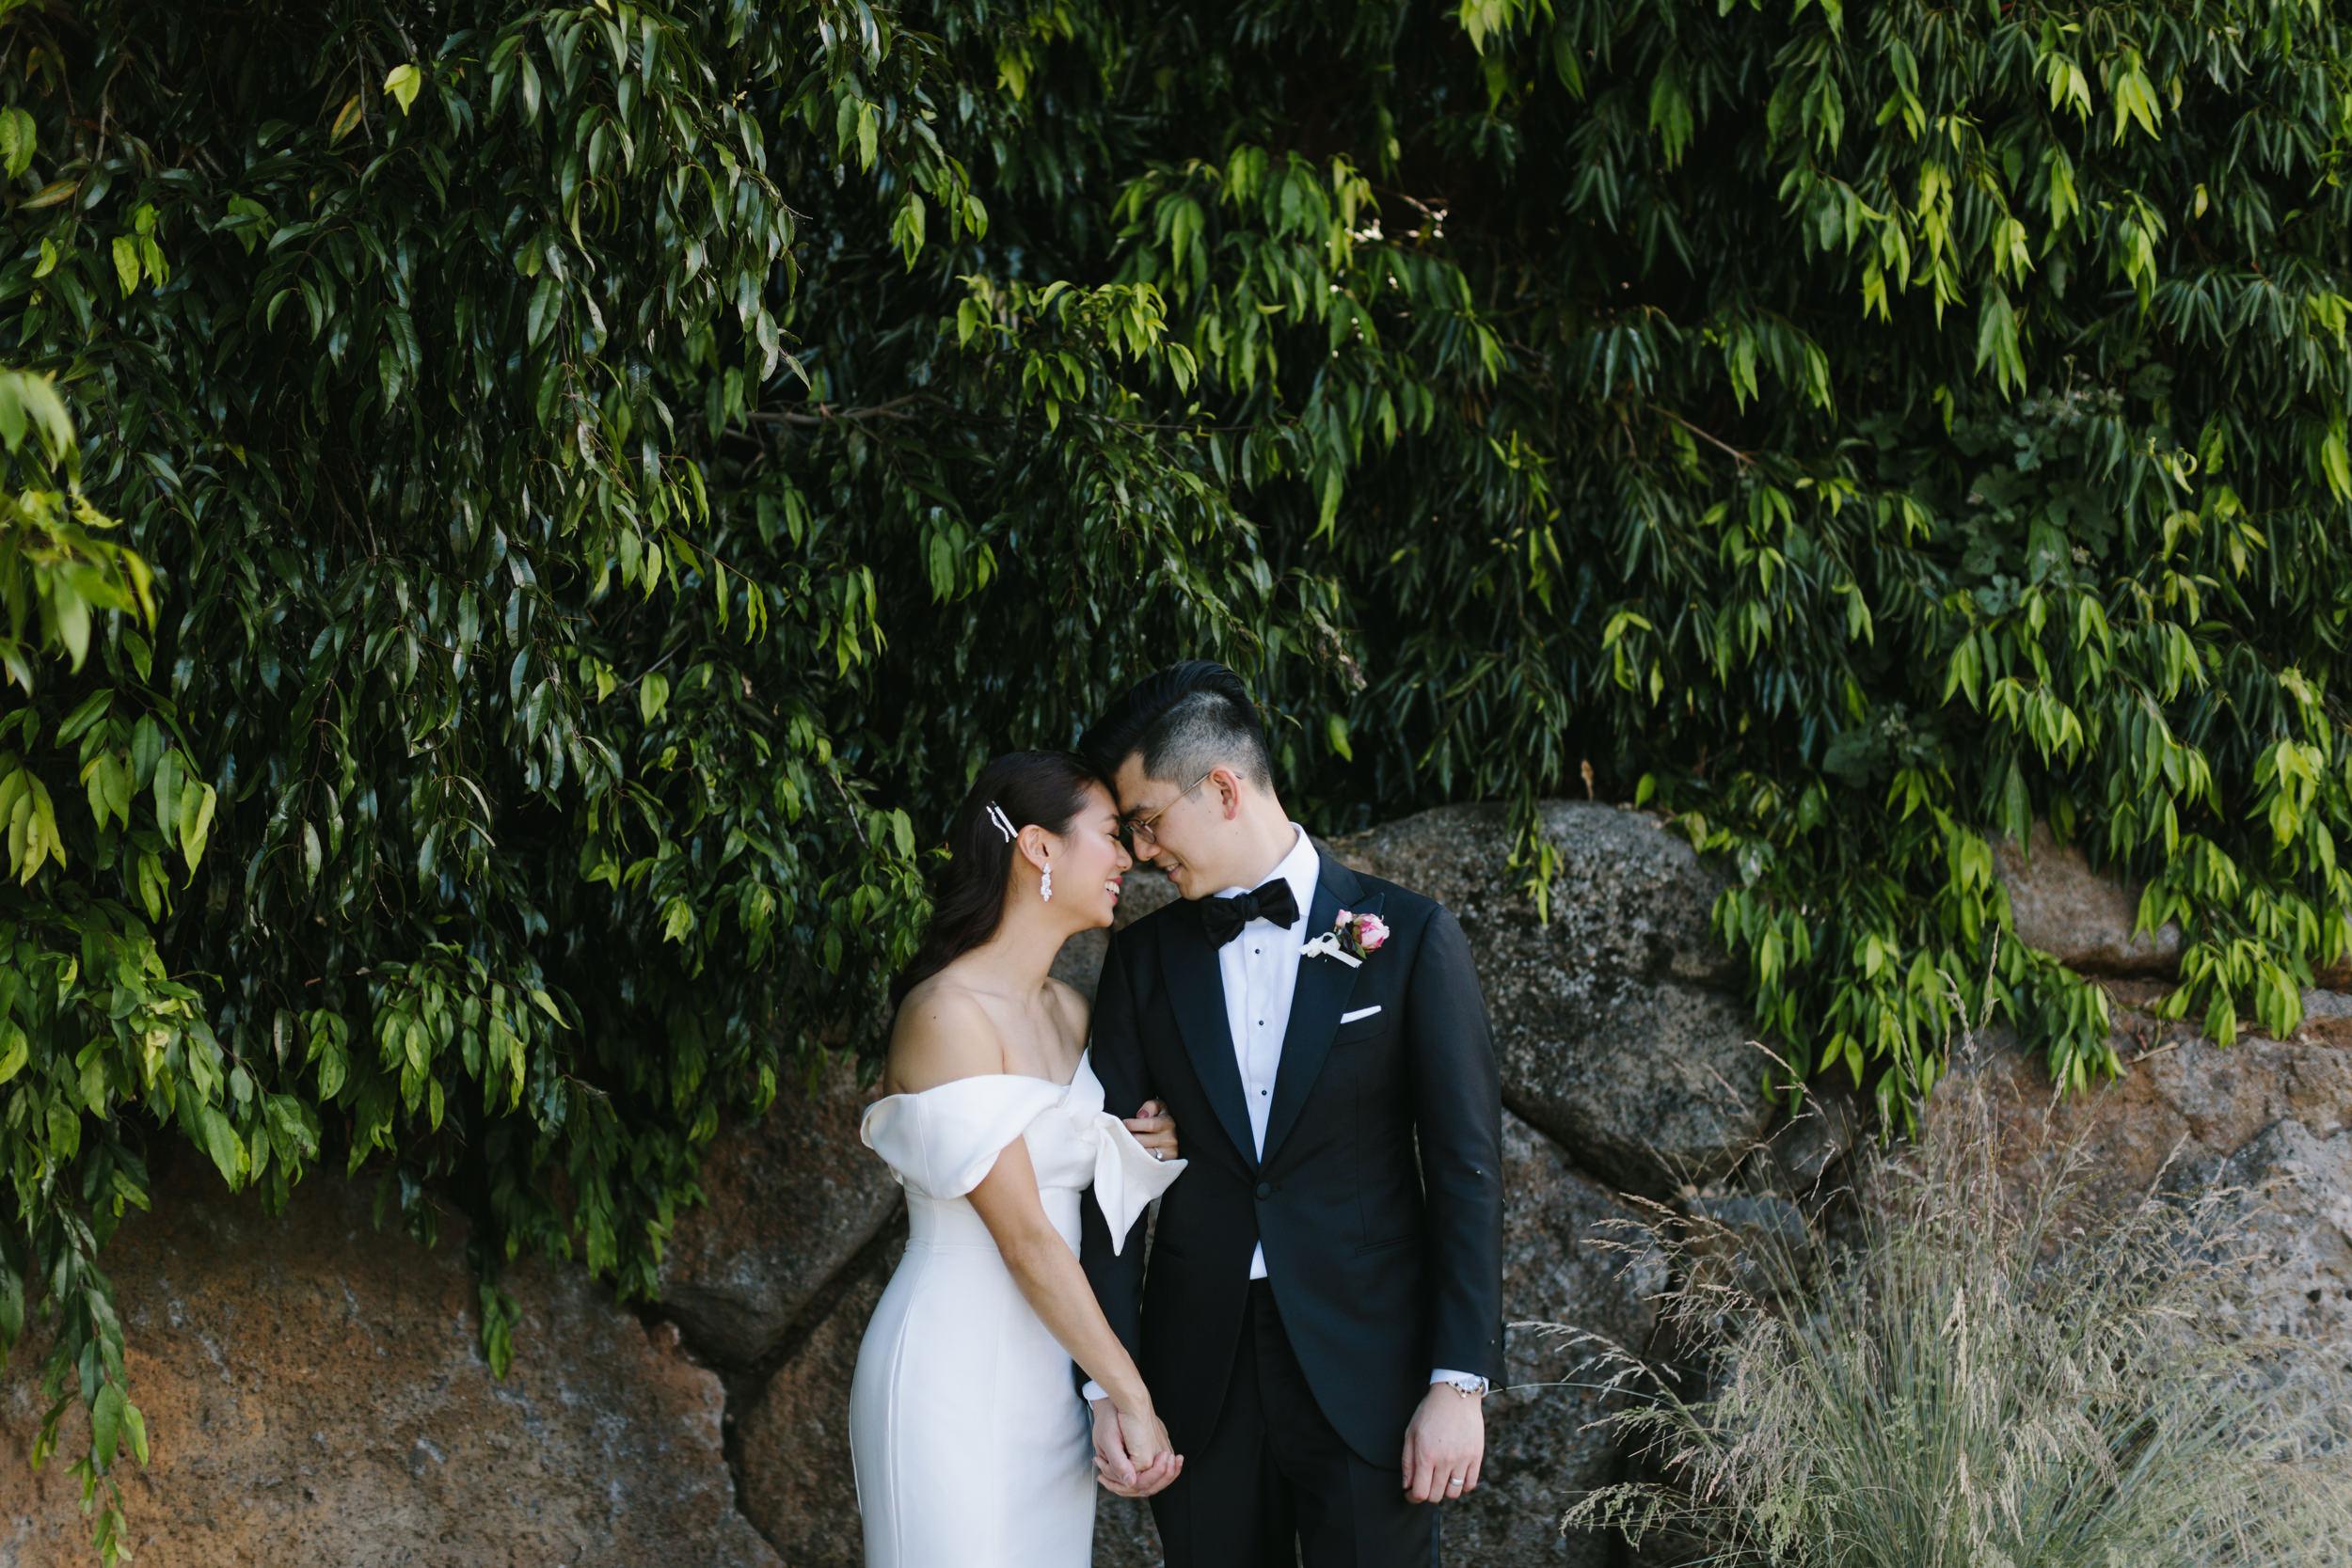 Melbourne Winery Wedding Daryl & Adeline 87.JPG